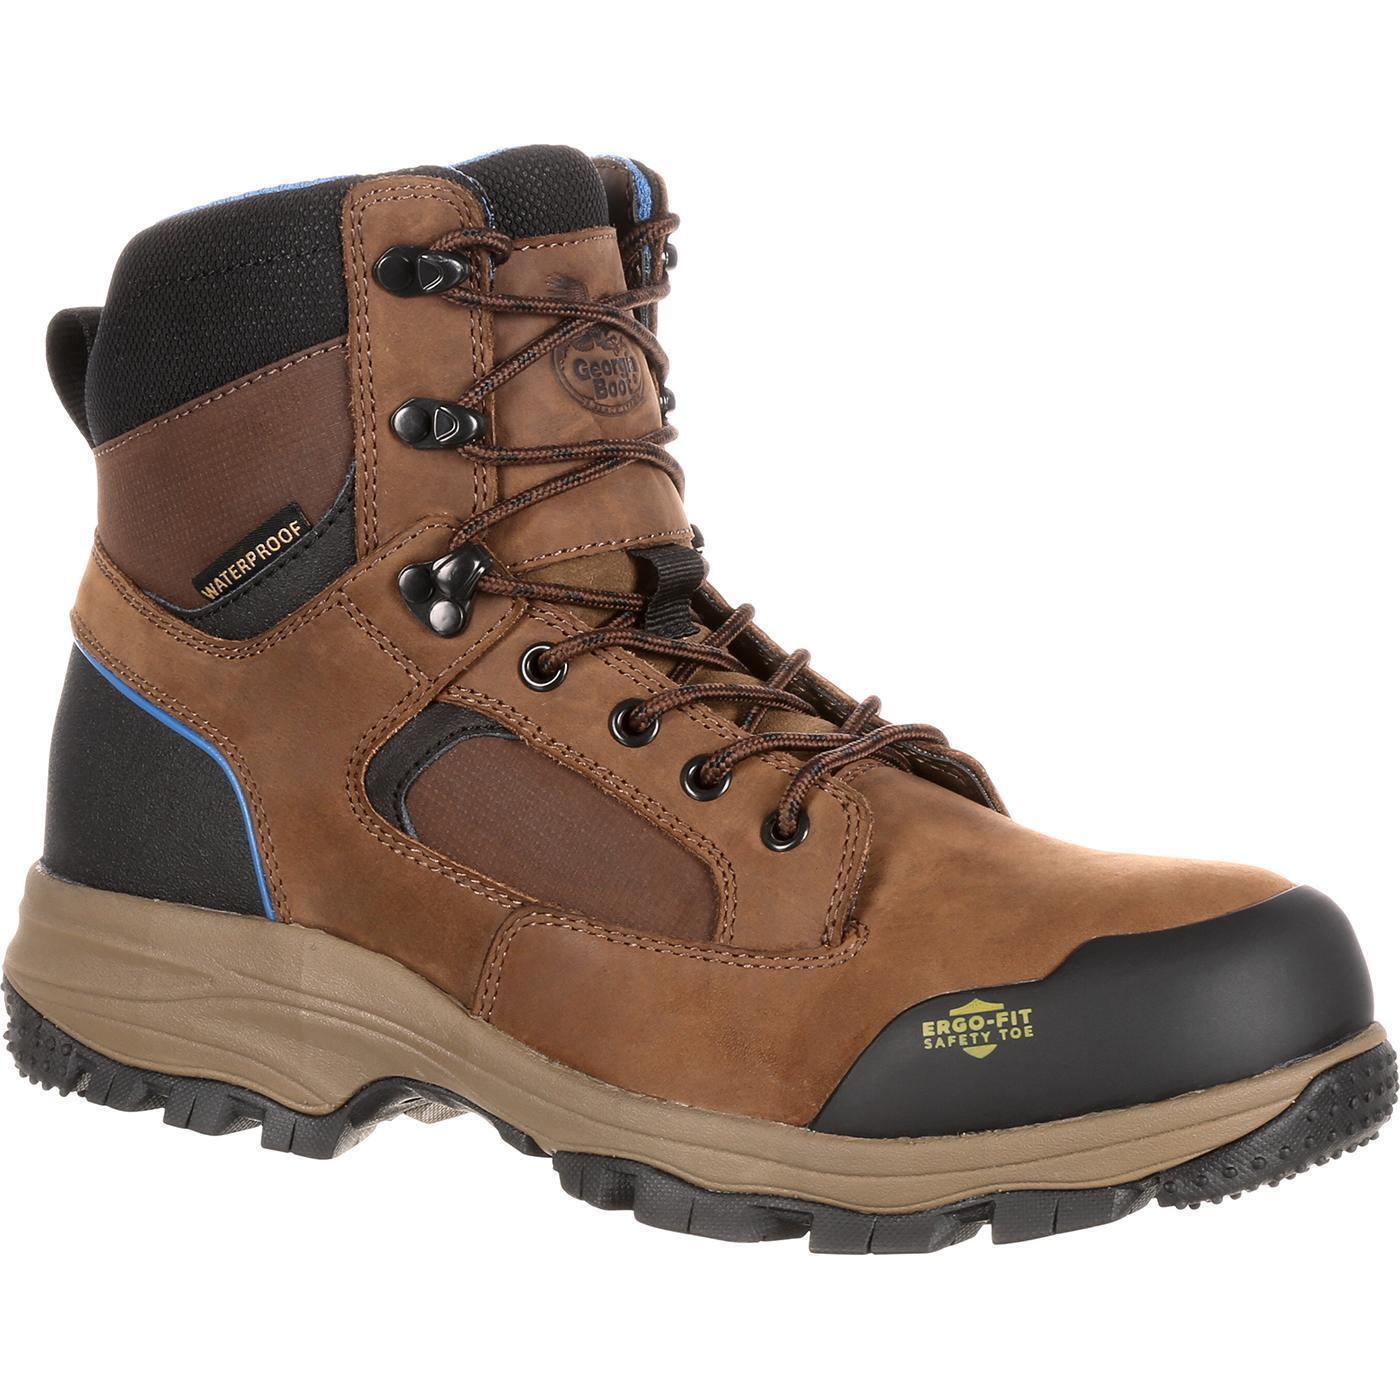 Georgia GB00108 6  bluee Collar Composite Toe Waterproof EH Rated Work Hiker Boot